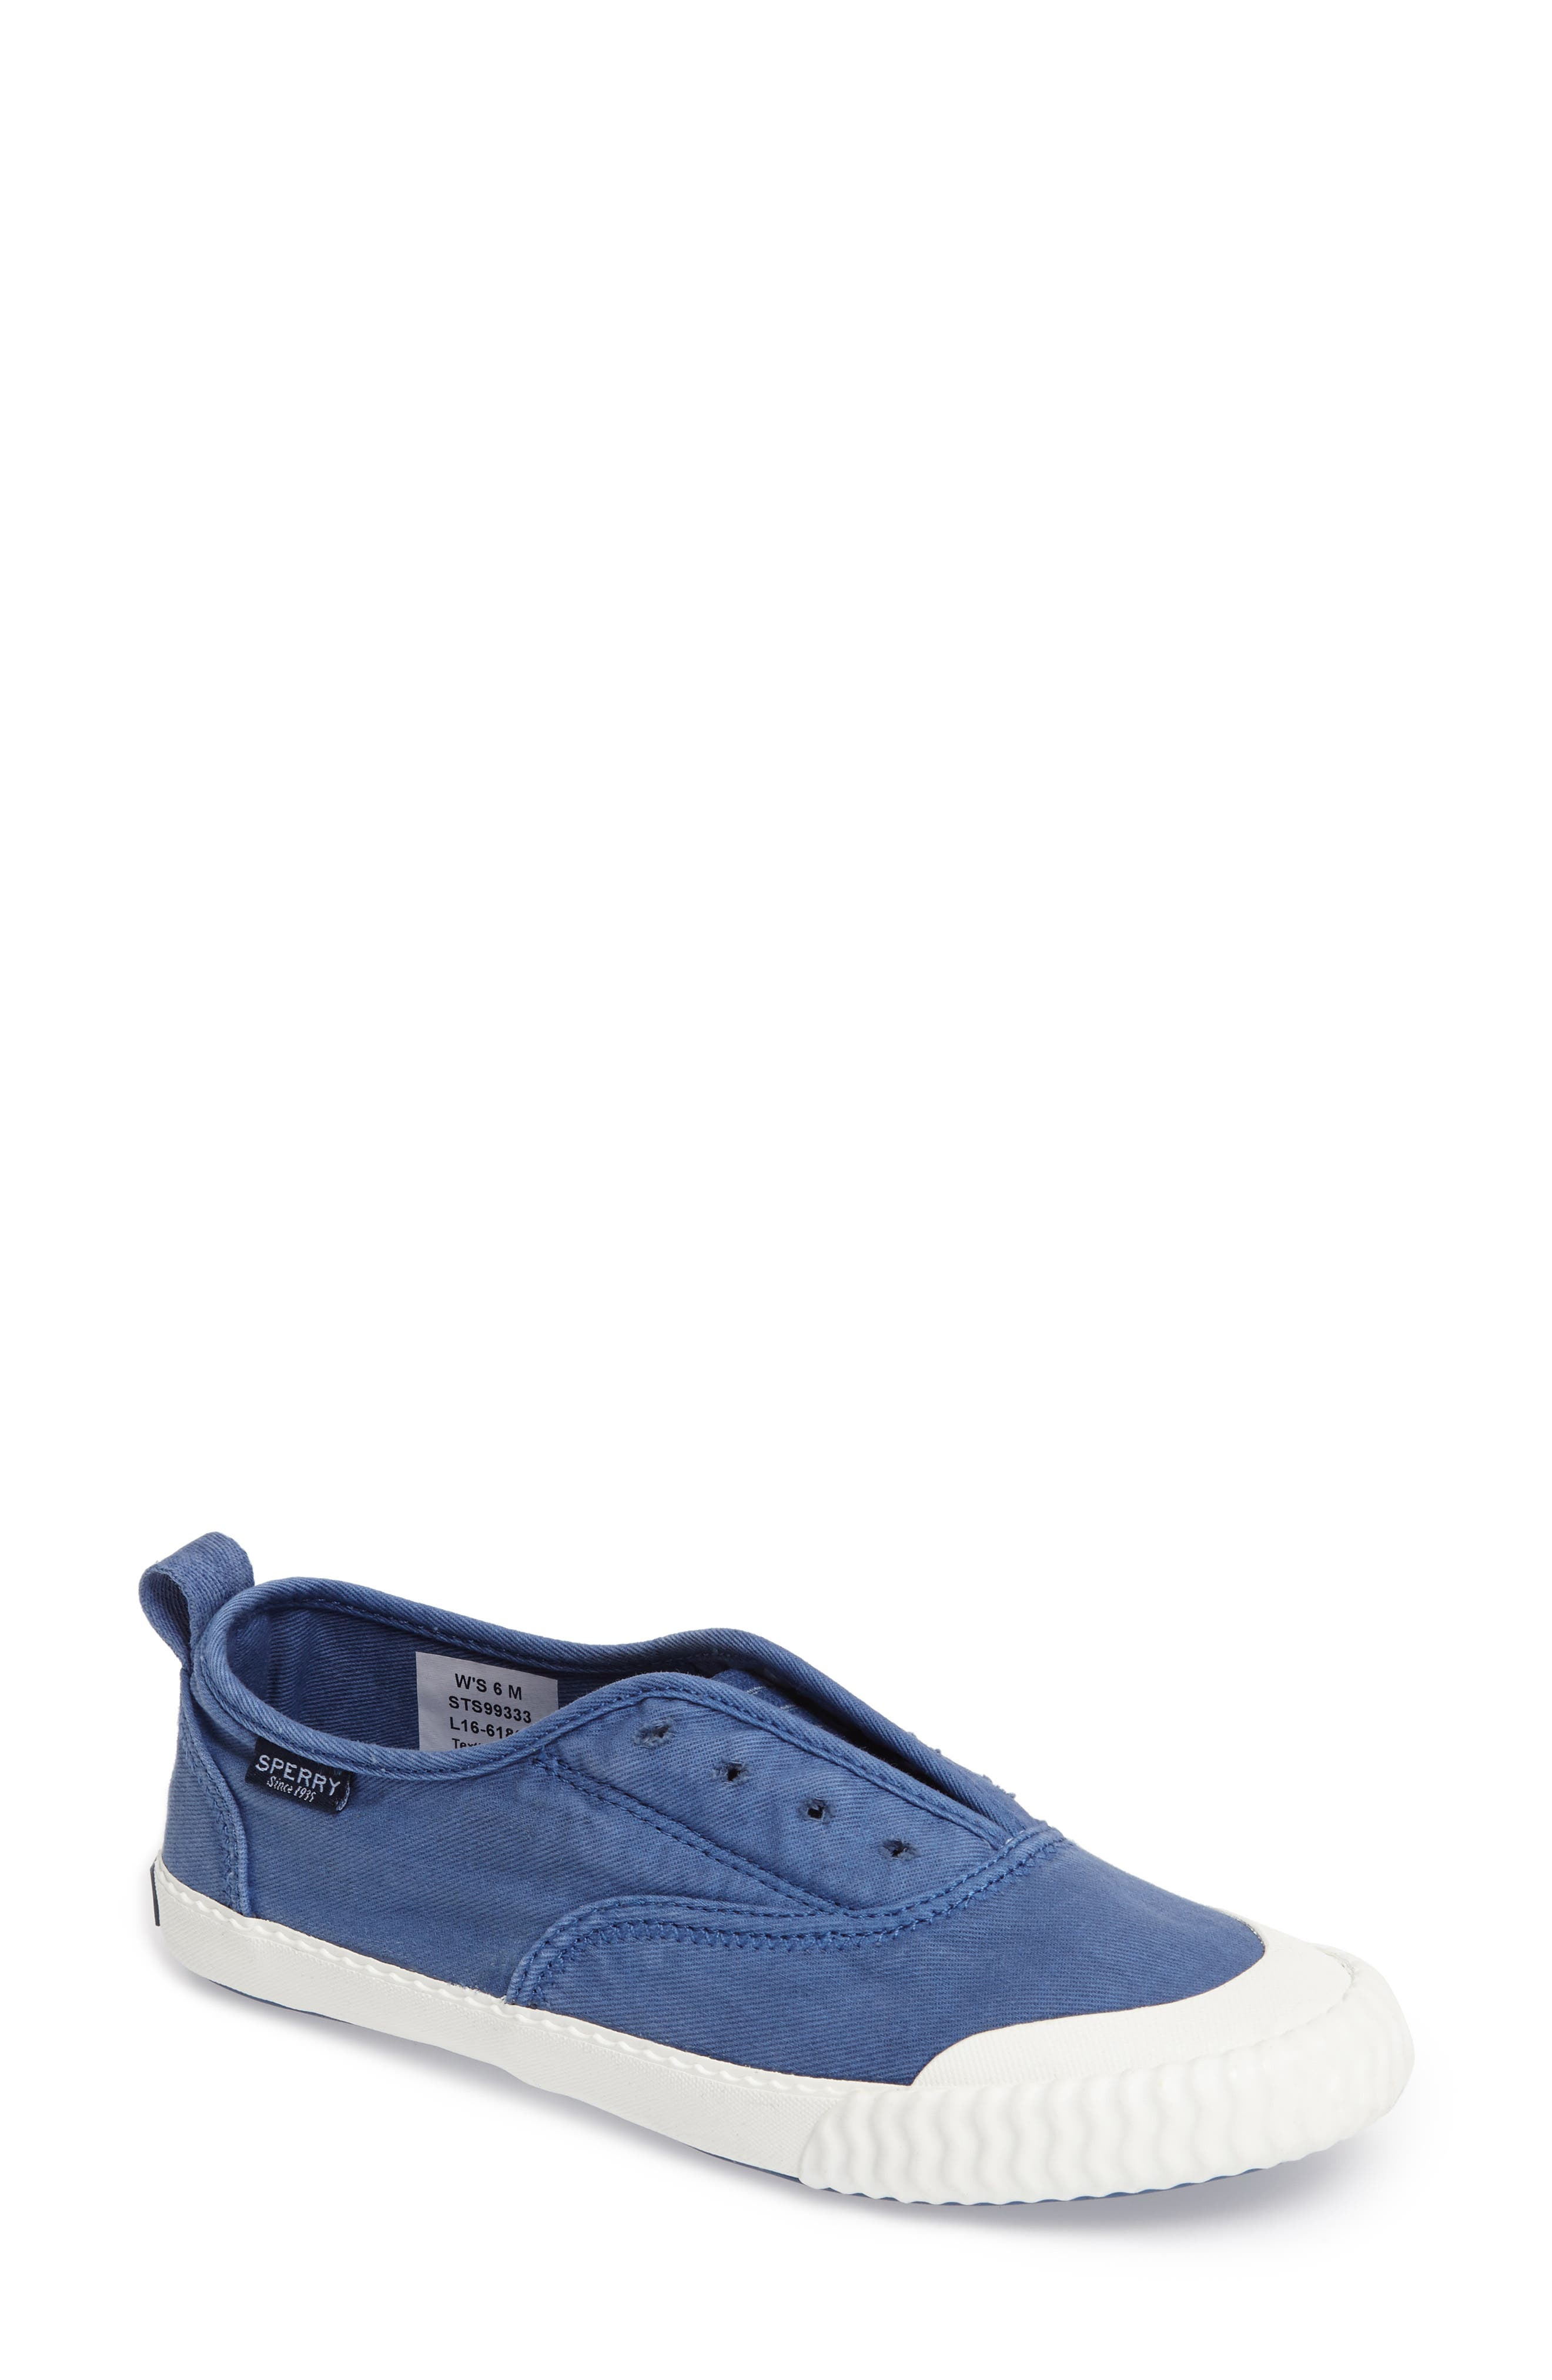 Sperry Sayel Slip-On Sneaker (Women)